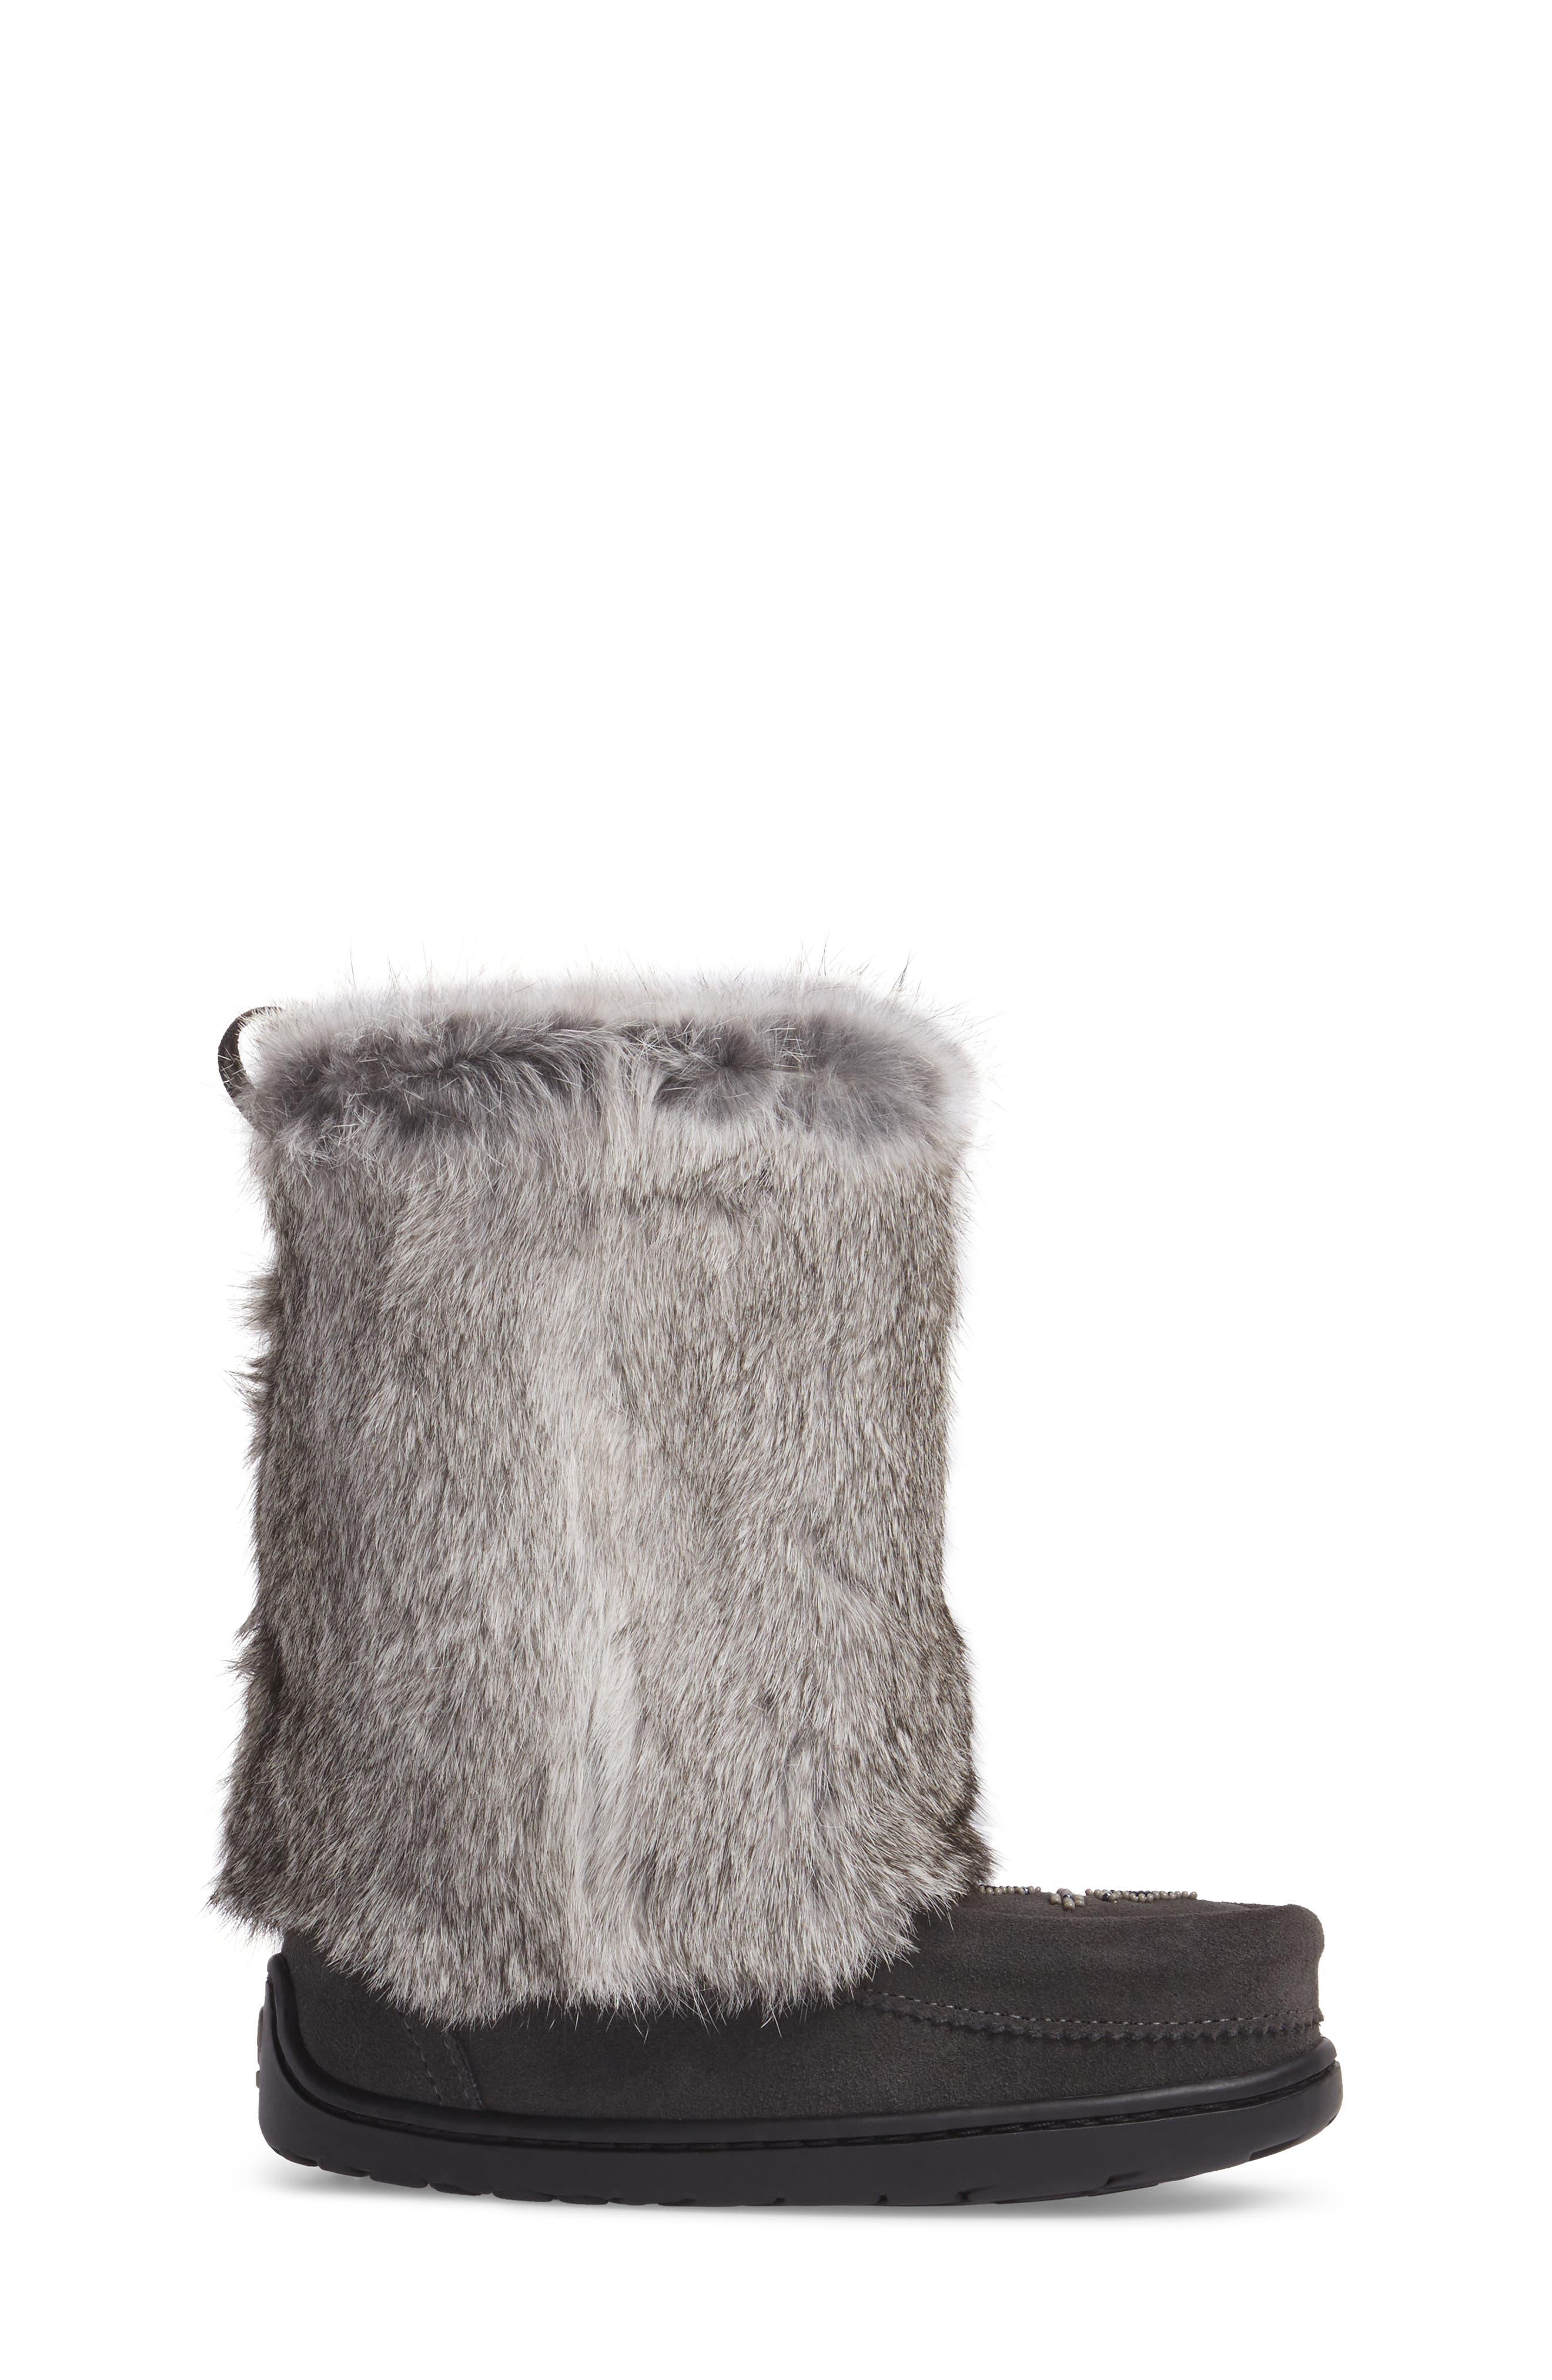 Nordic Genuine Rabbit Fur & Genuine Shearling Mukluk Boot,                             Alternate thumbnail 3, color,                             Charcoal